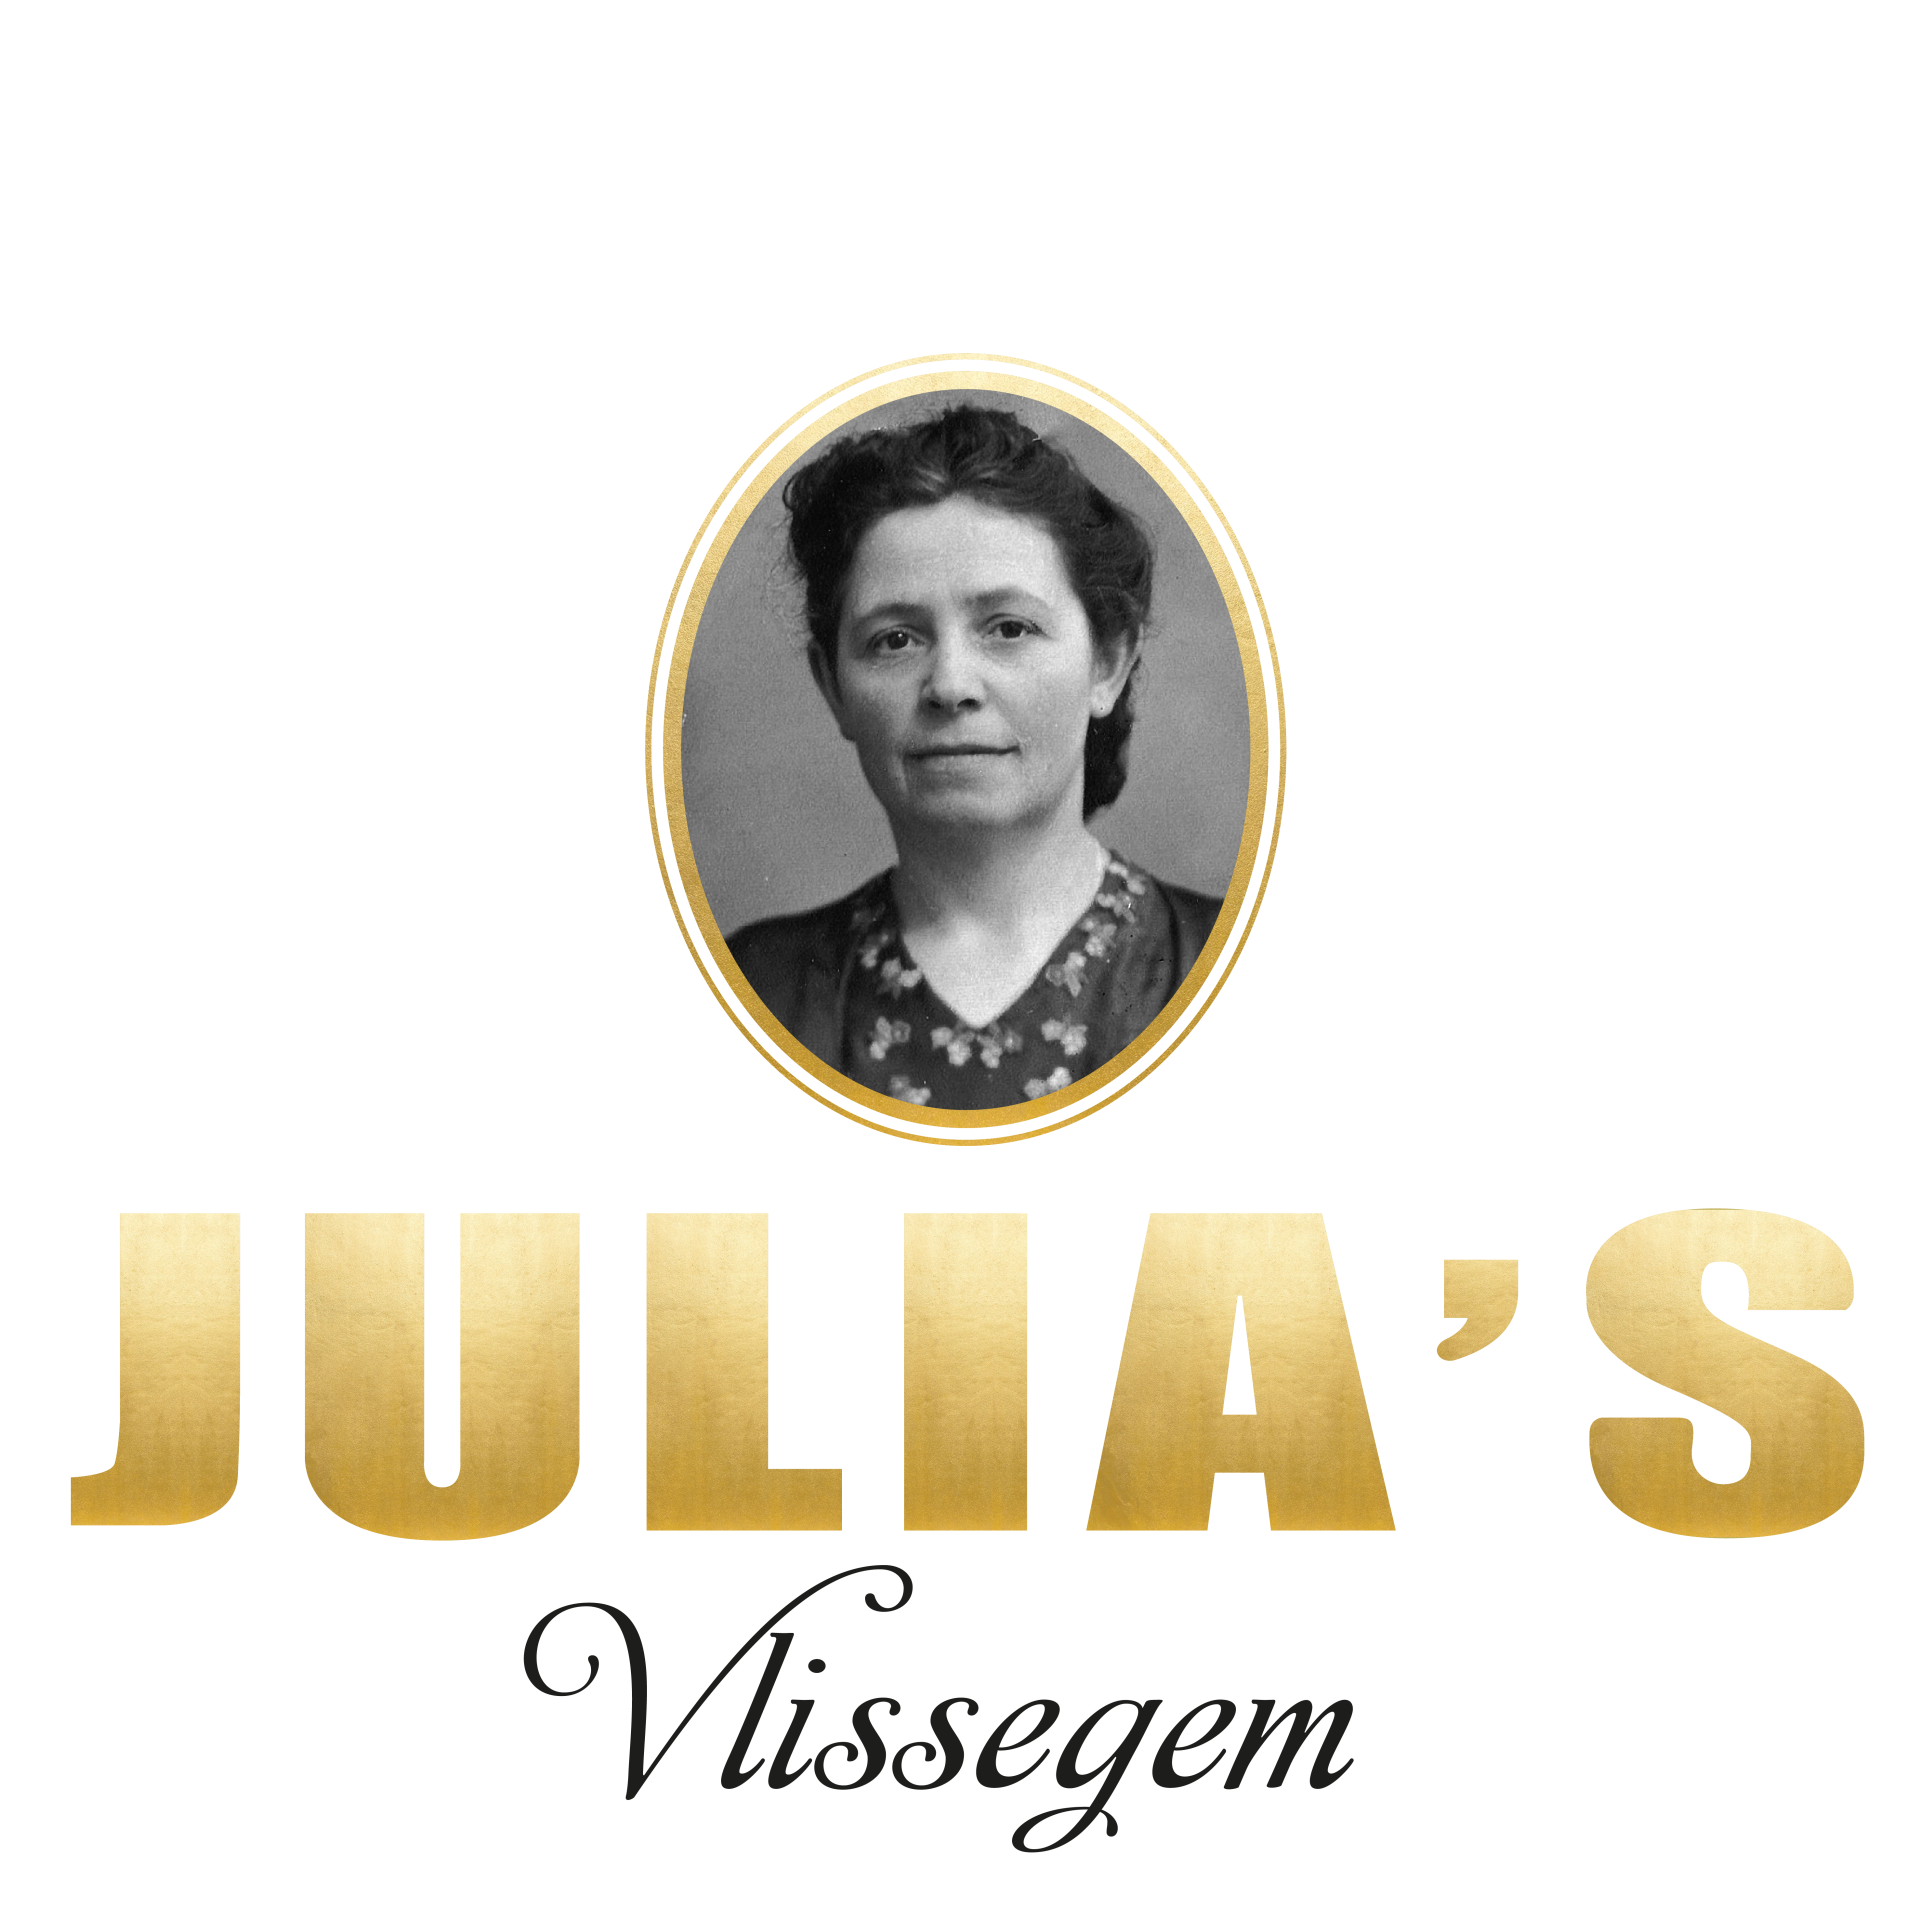 Julia's Vlissegem